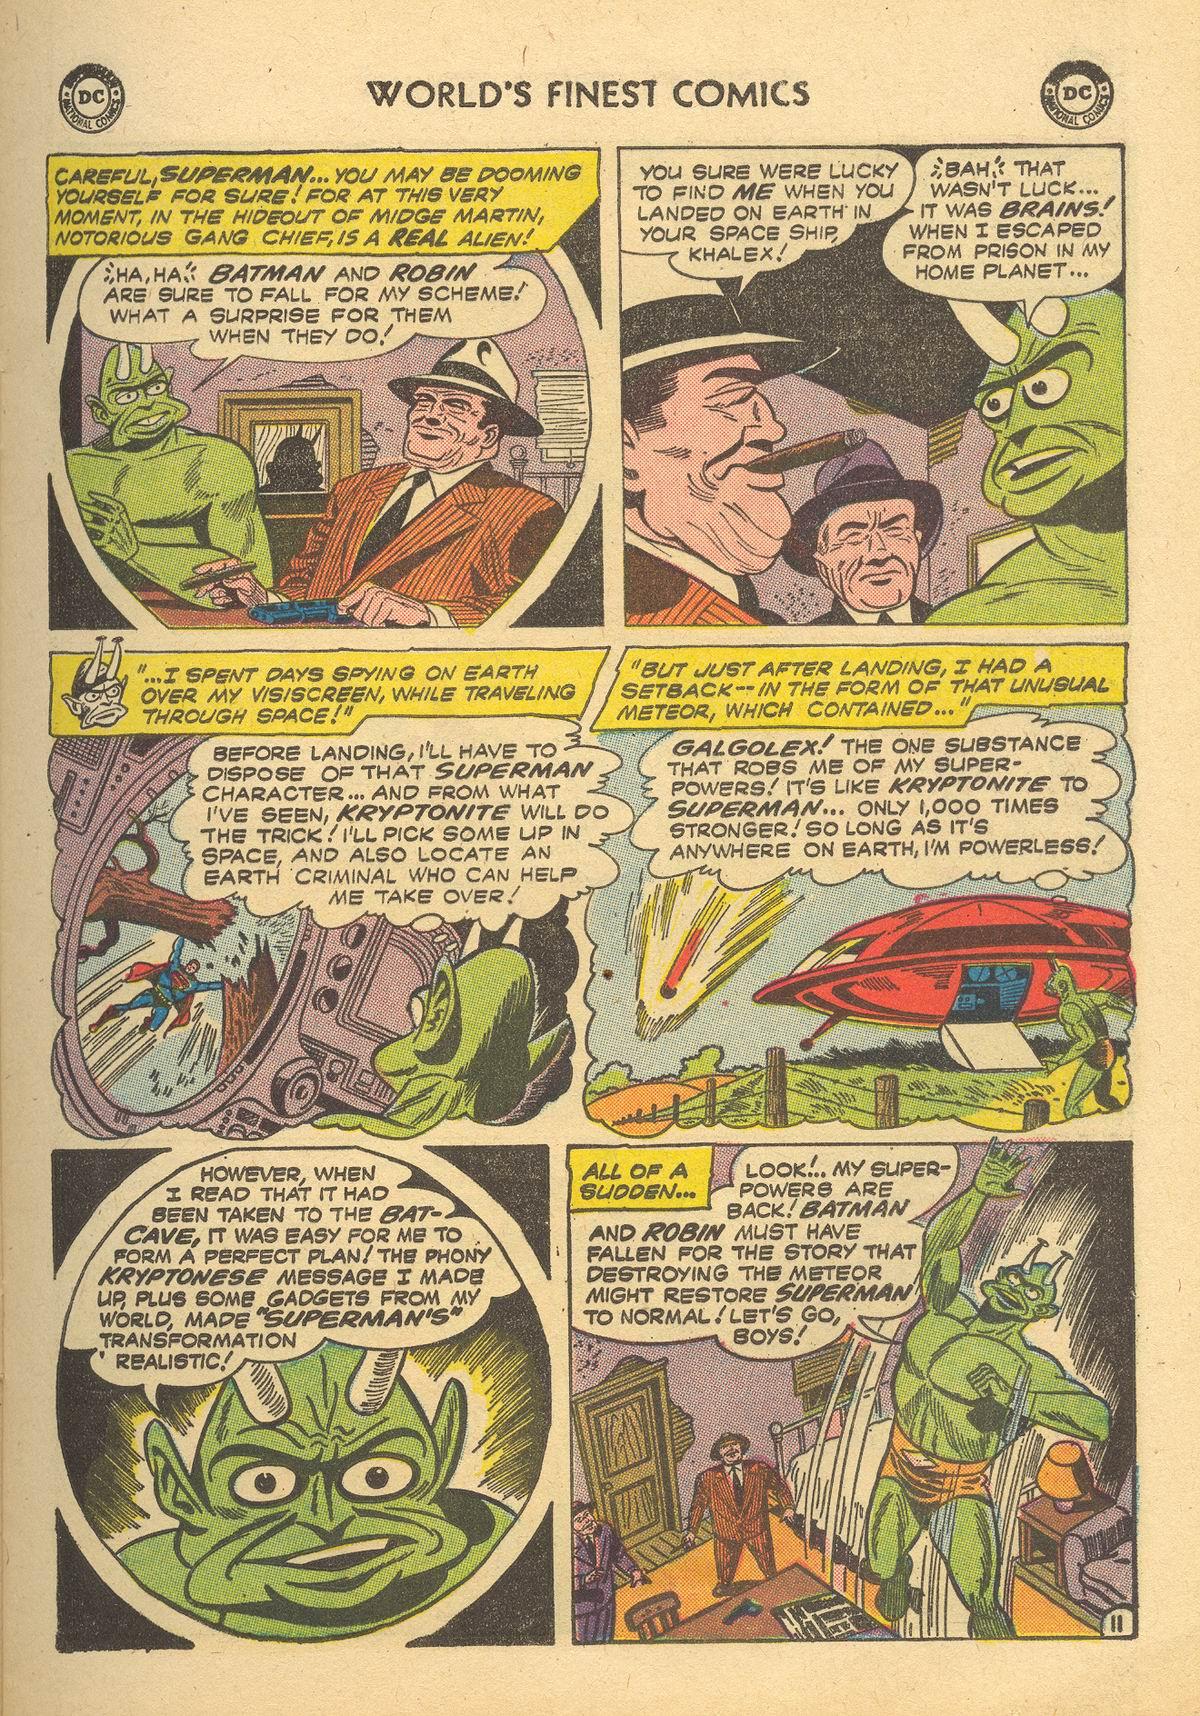 Read online World's Finest Comics comic -  Issue #105 - 13